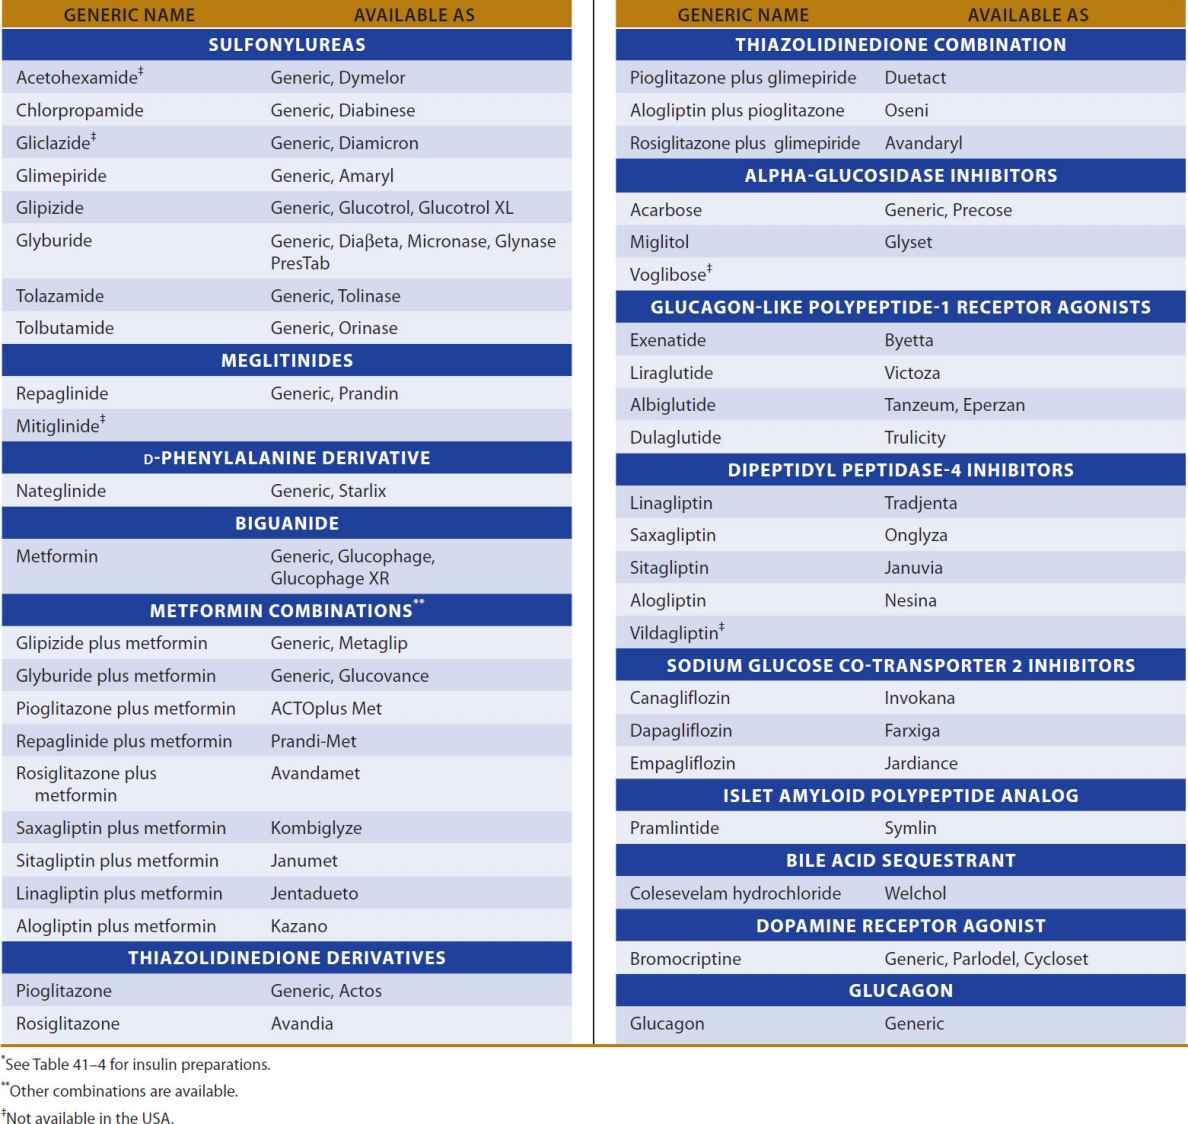 nitrofurantoin for cystitis